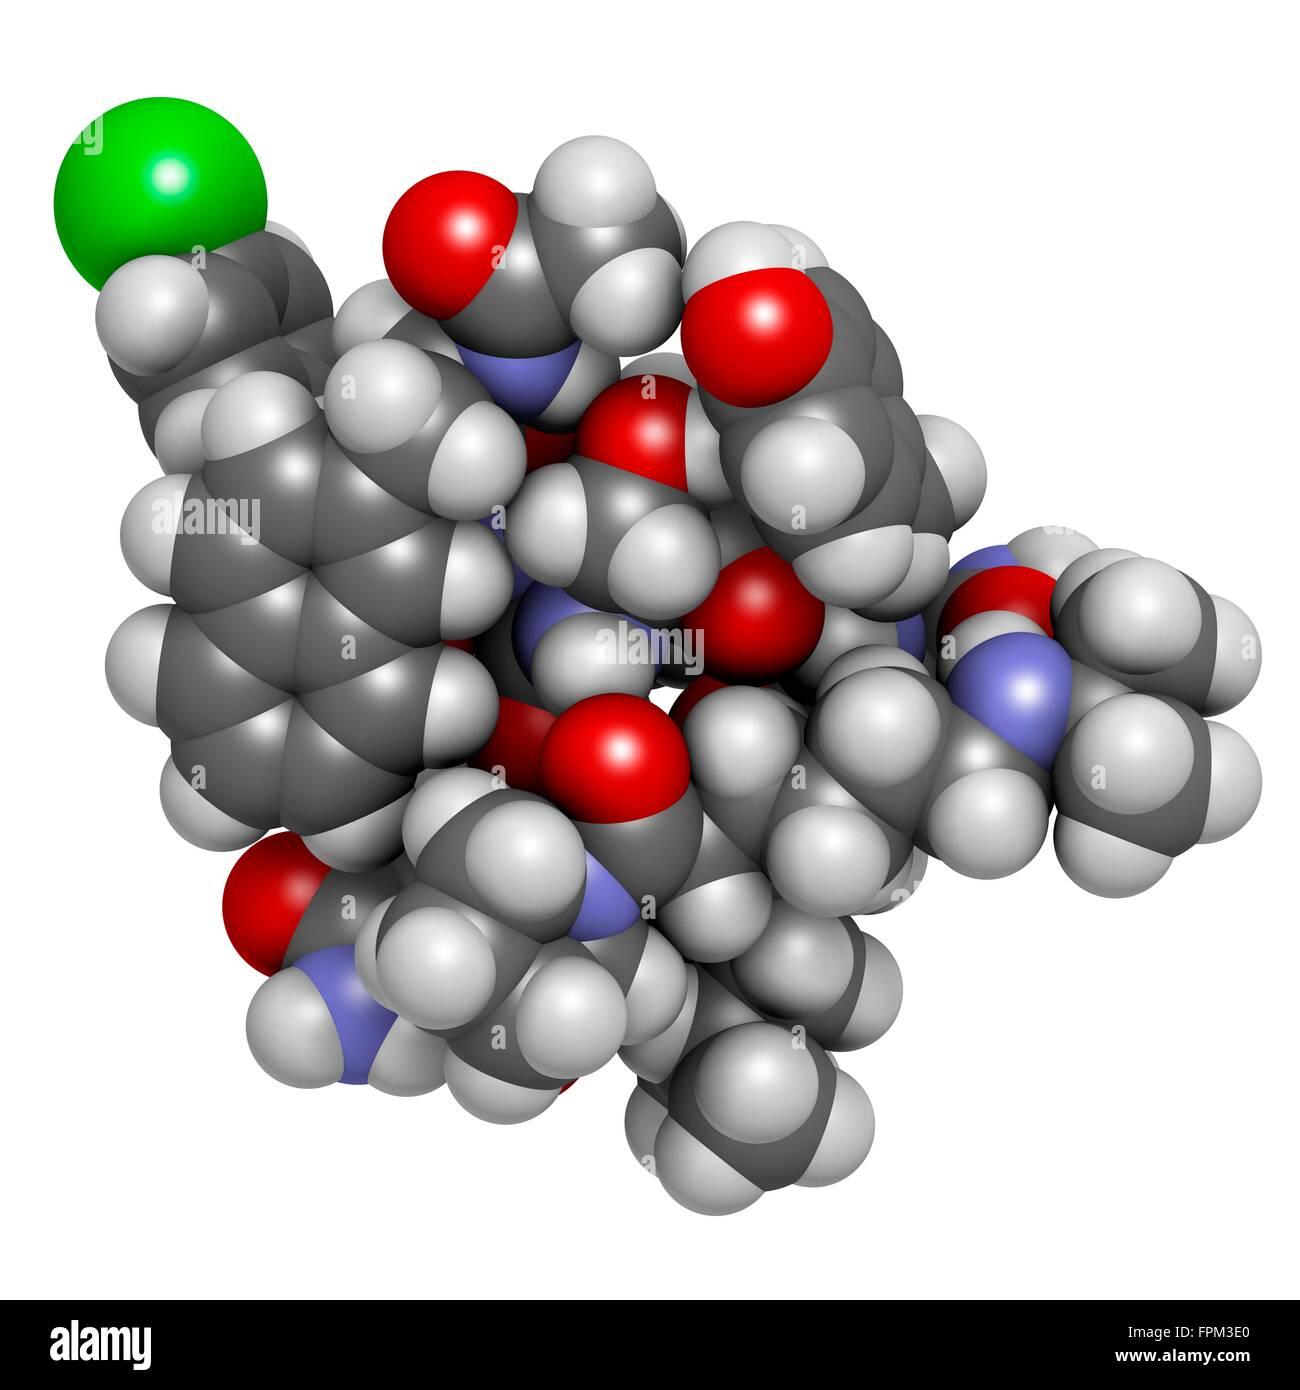 Abarelix drug molecule (g adotropin-releasing horm e GnRH